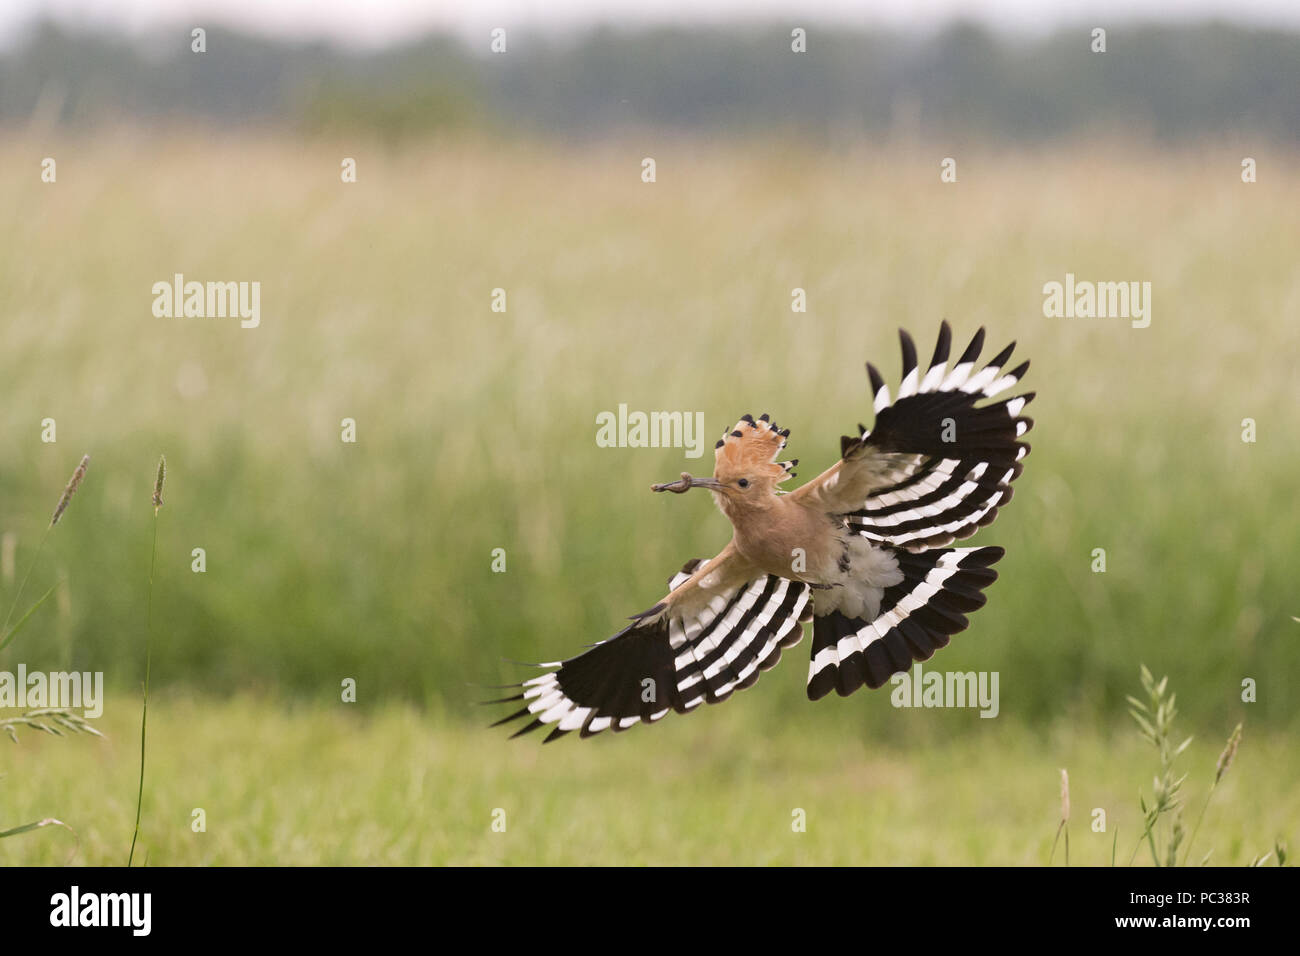 Eurasian Hoopoe (Upupa epops) adult, flying, with caterpillar in beak, Hortobagy N.P., Hungary, May Stock Photo